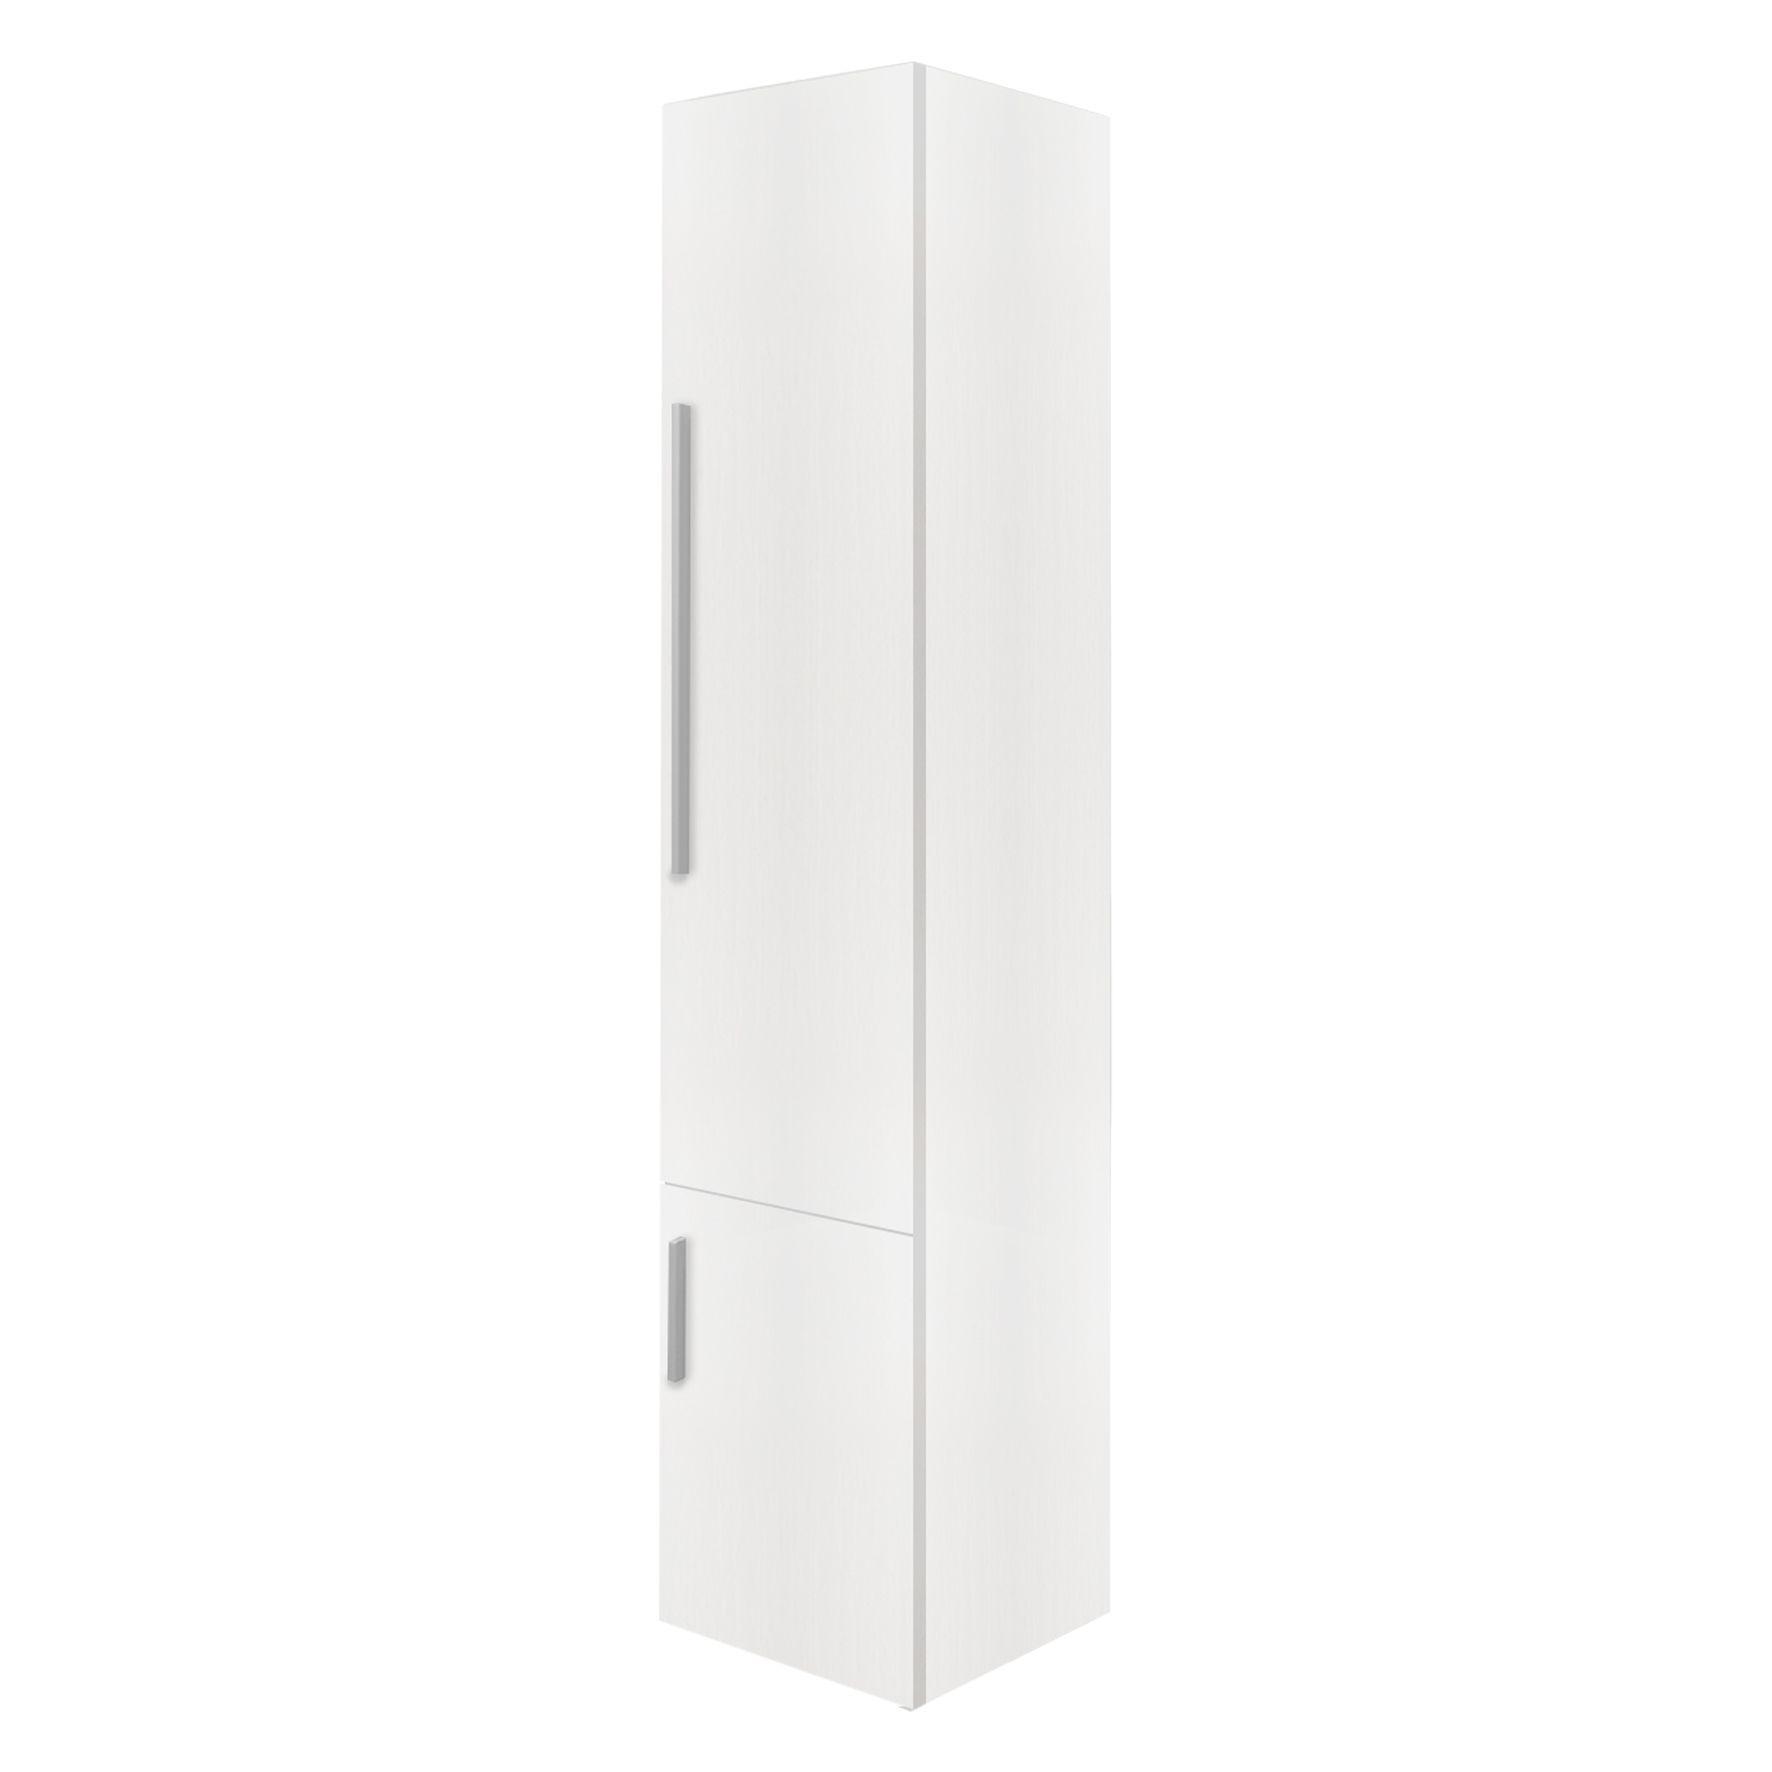 Differnz Style Hoge Kast rechts wit